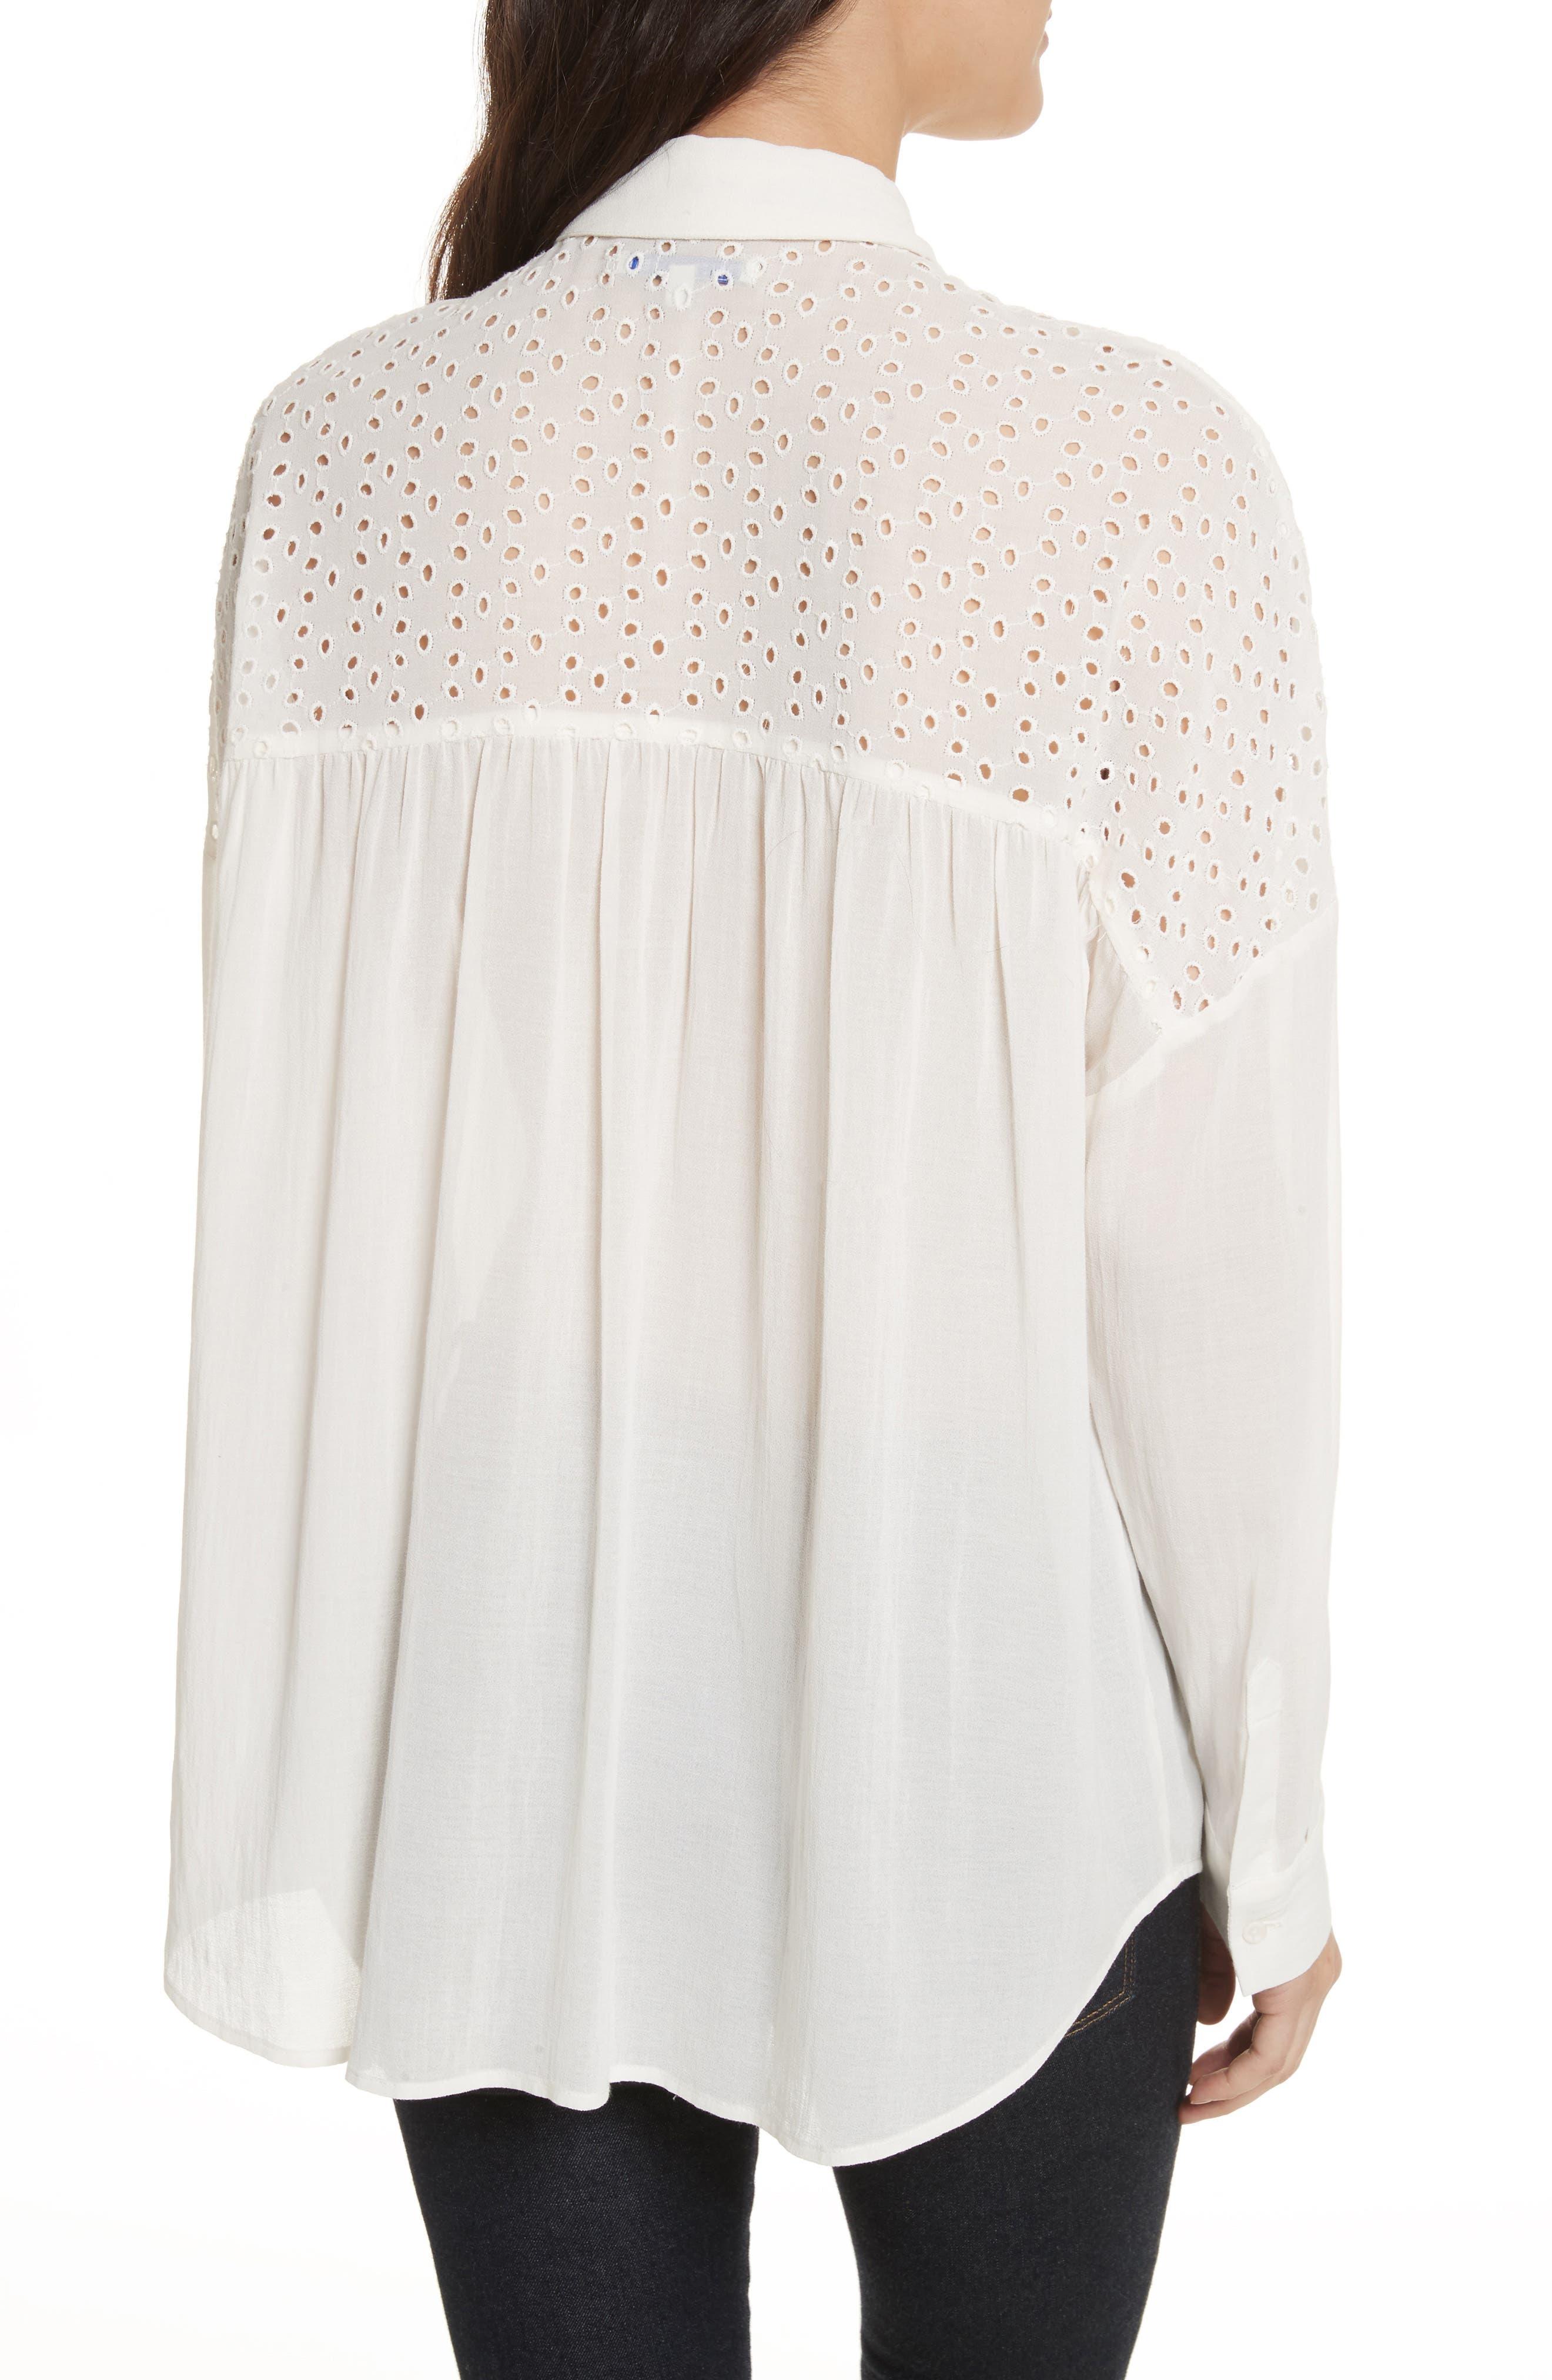 Pearla Shirt,                             Alternate thumbnail 4, color,